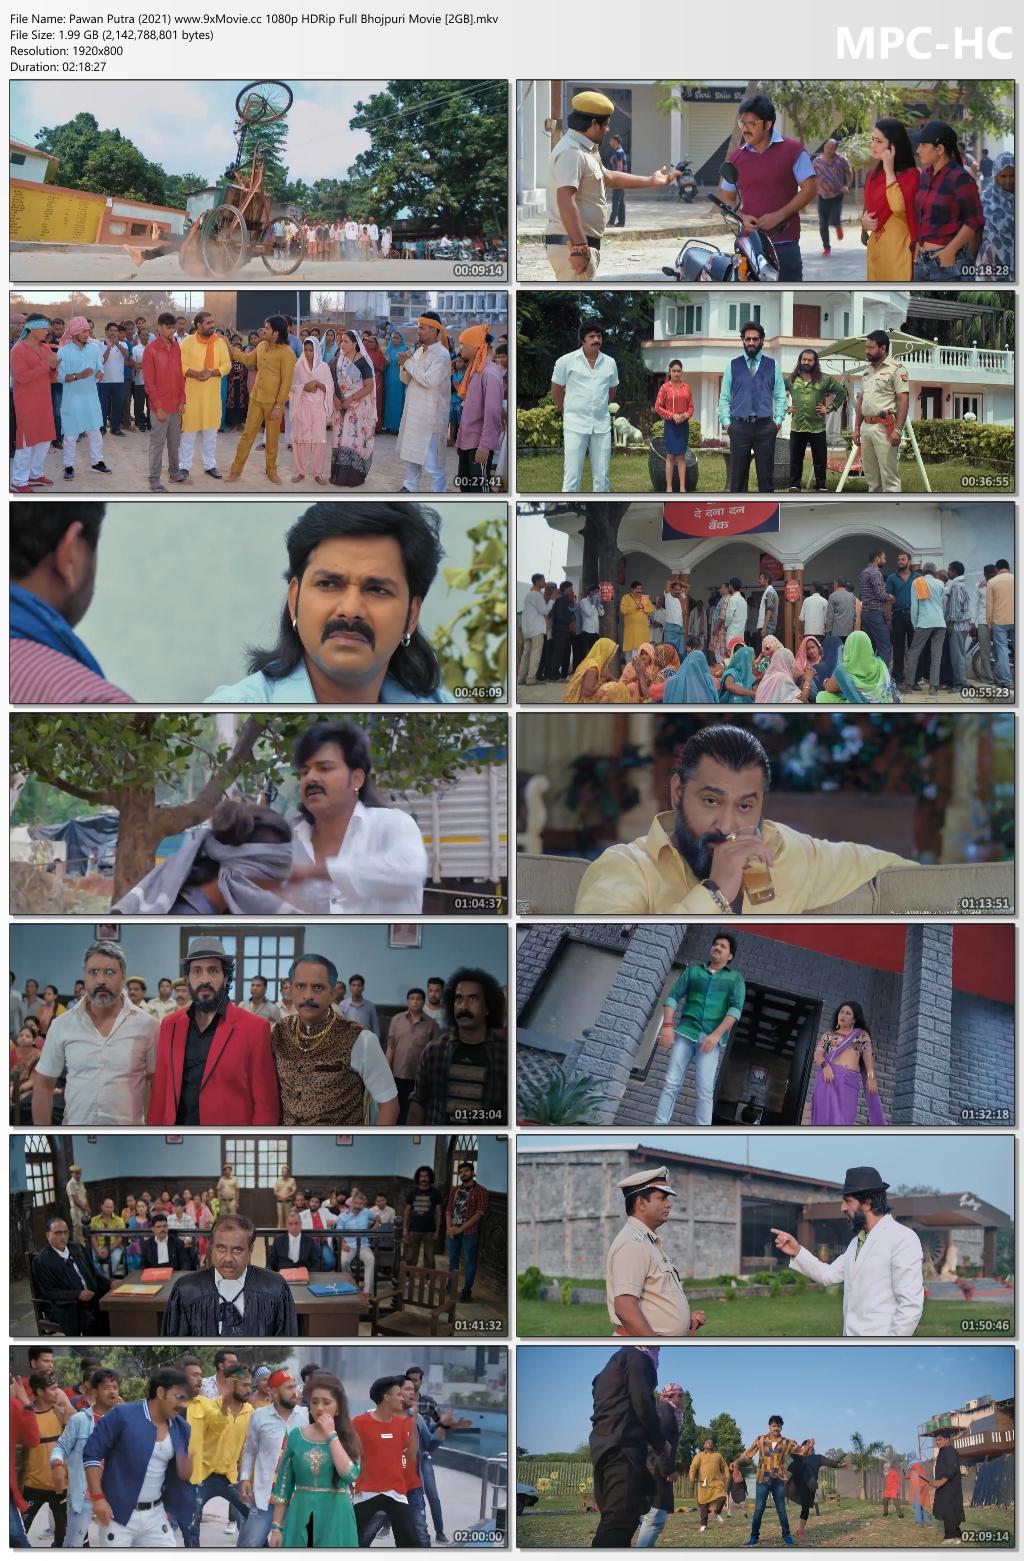 Pawan-Putra-2021-www-9x-Movie-cc-1080p-HDRip-Full-Bhojpuri-Movie-2-GB-mkv